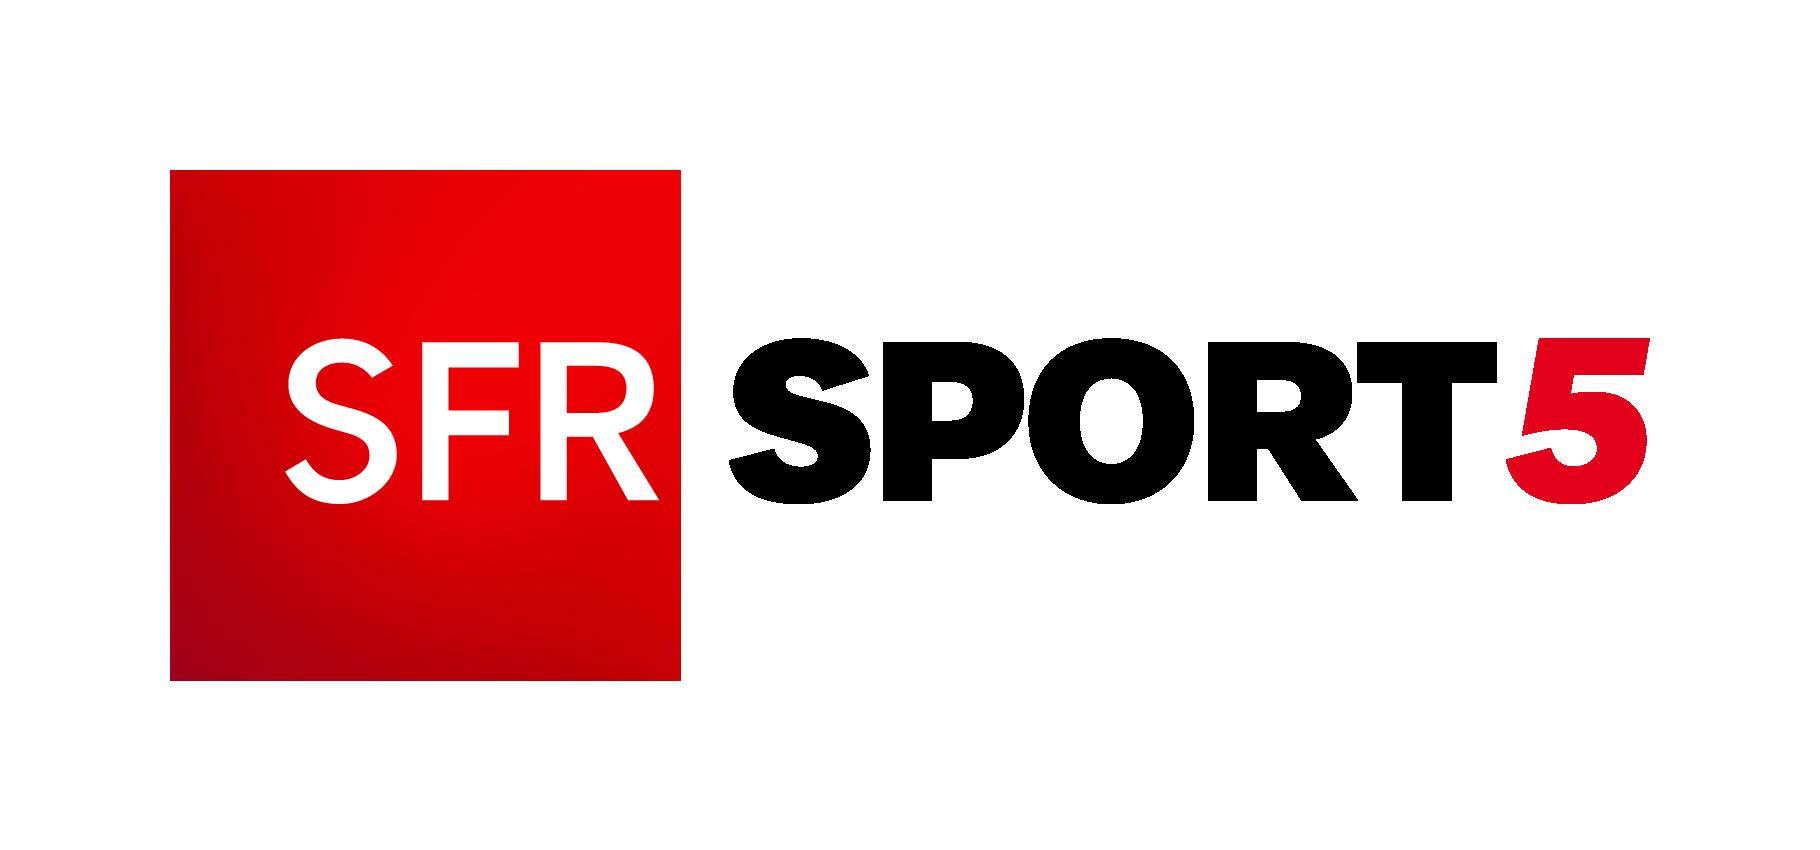 SFR_SPORT5_rvb_typo_noire